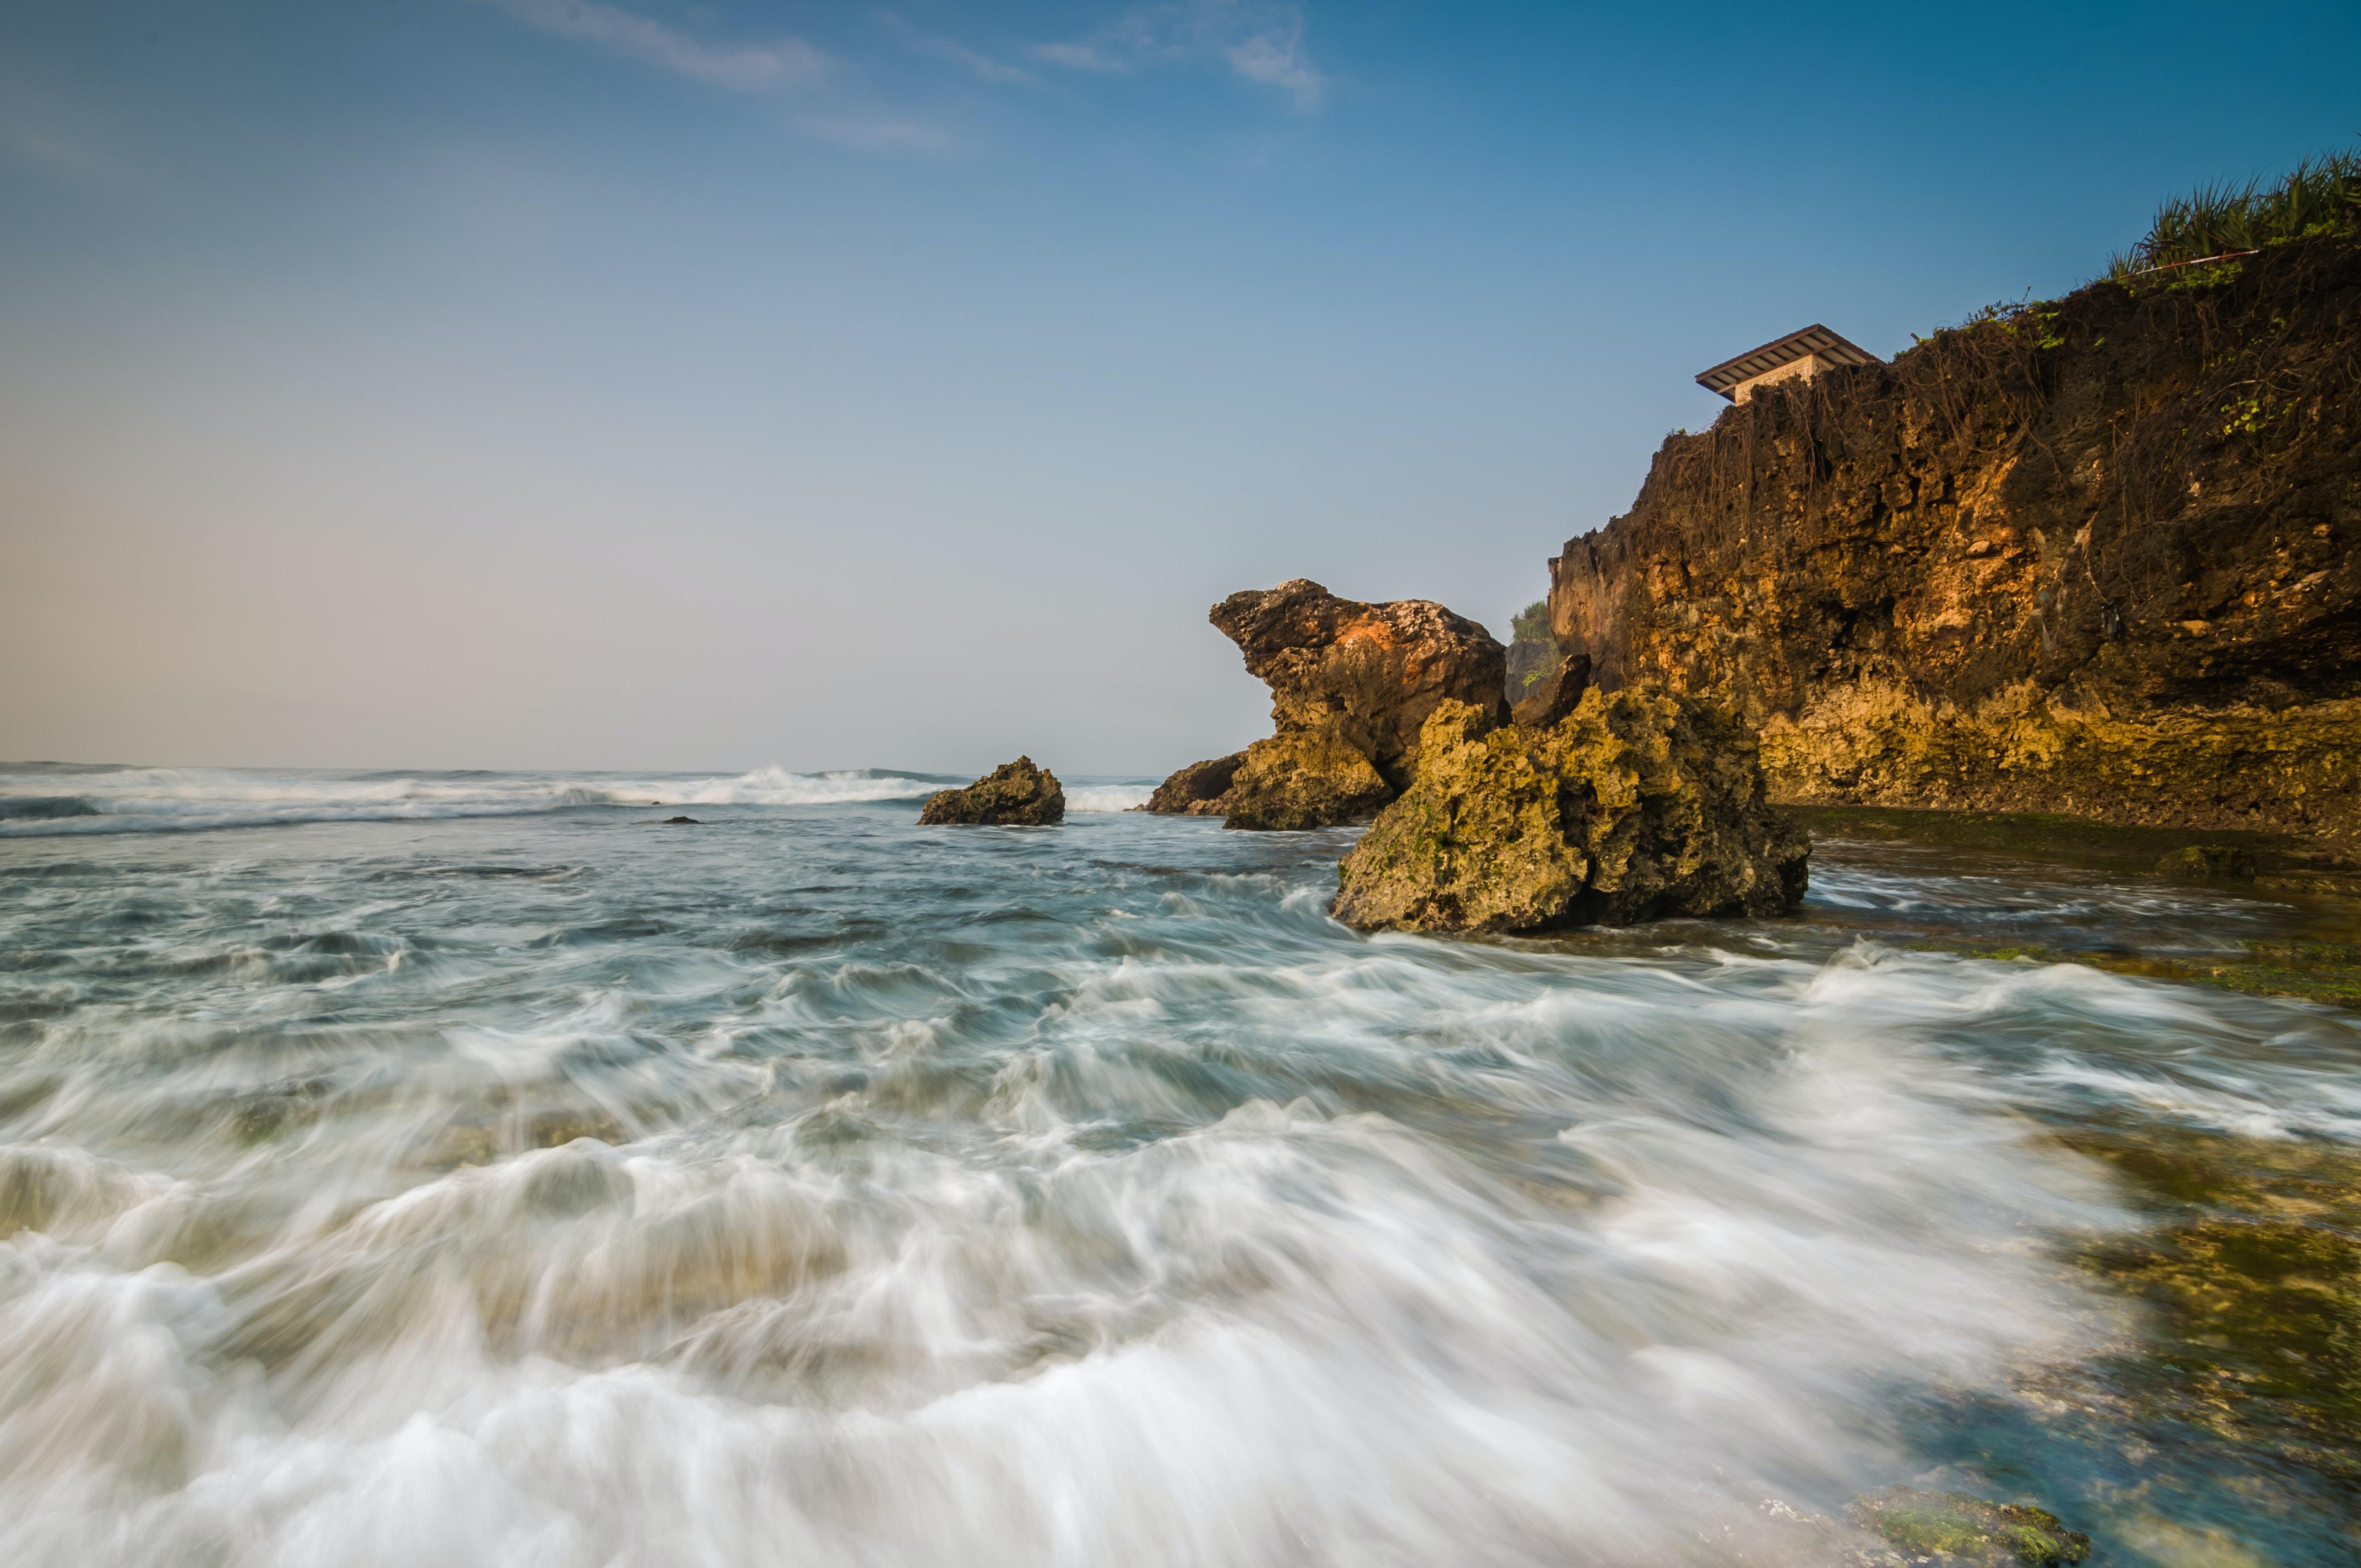 Long exposure photo of ocean washing on the rocky coast at Pantai Krakal